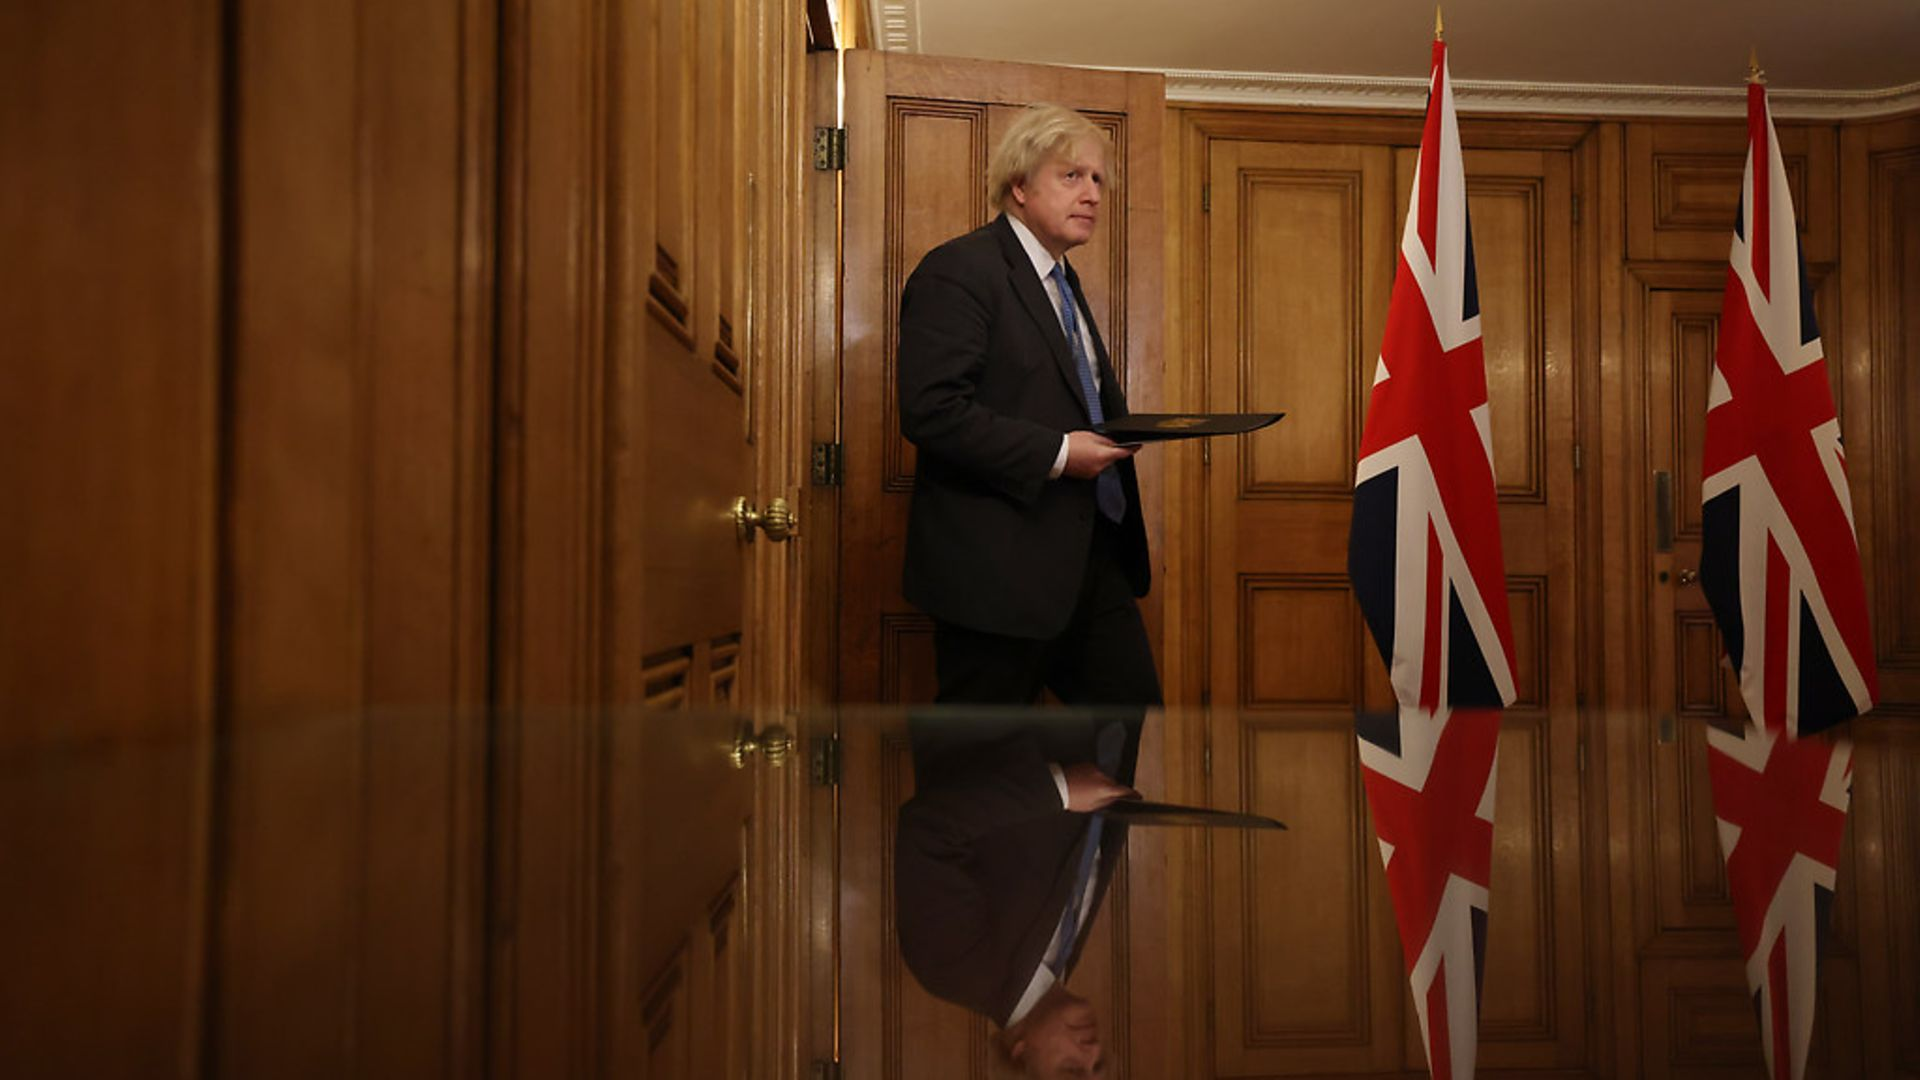 Boris Johnson holds a press conference at 10 Downing Street - Credit: Simon Dawson / No10 Downing Street